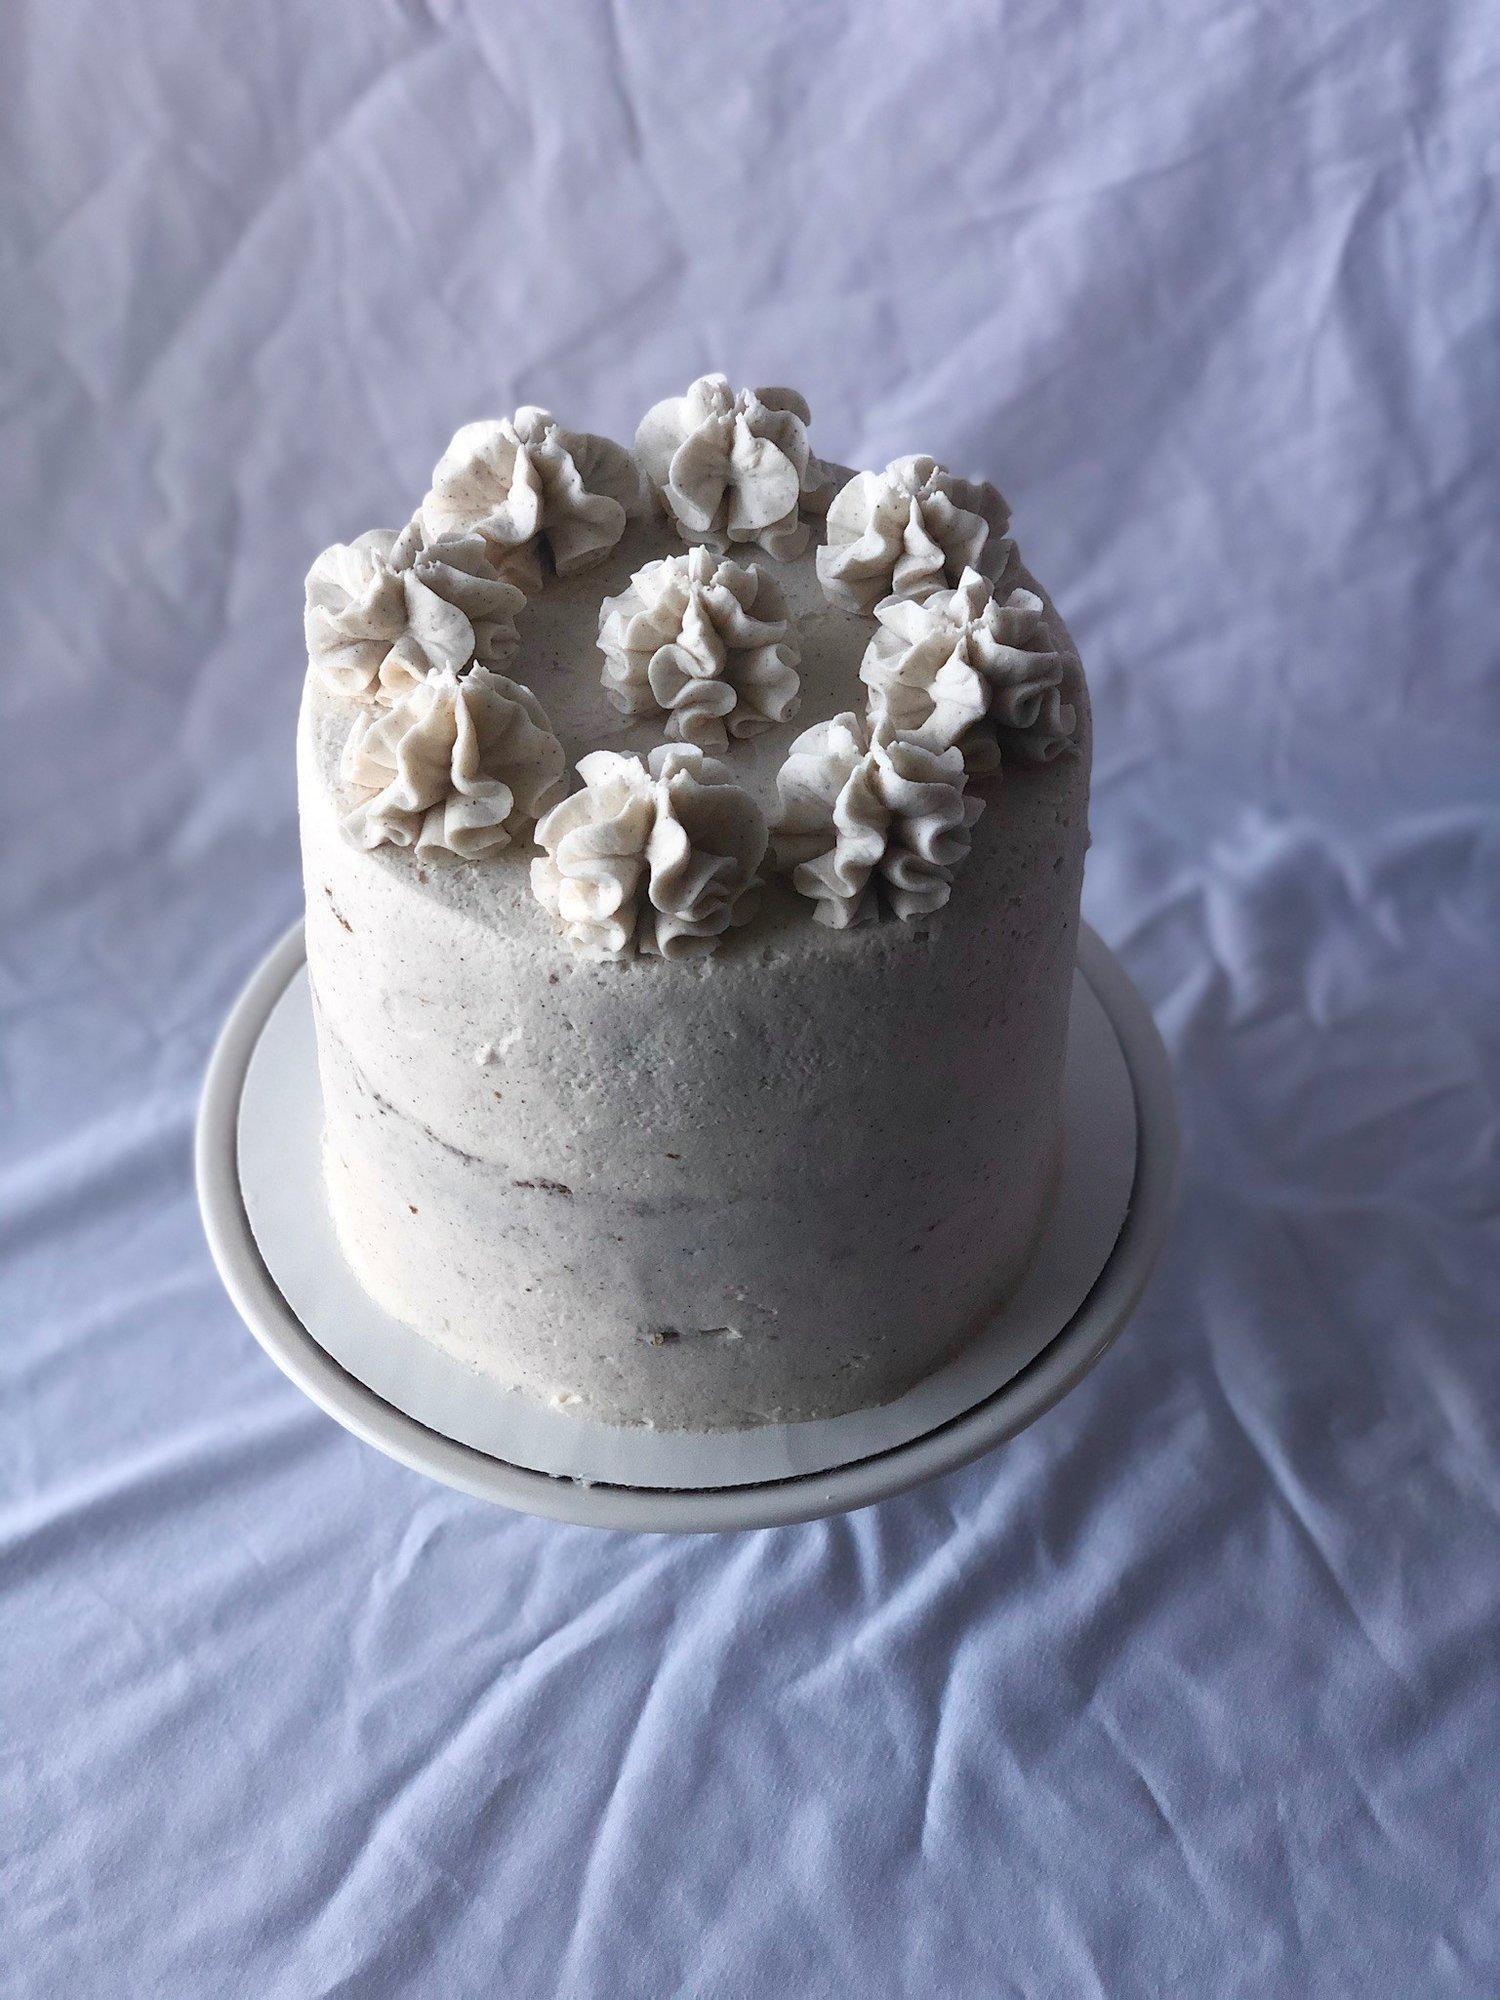 Buttermilk Carrot Cake Kay Ann The Creative Company